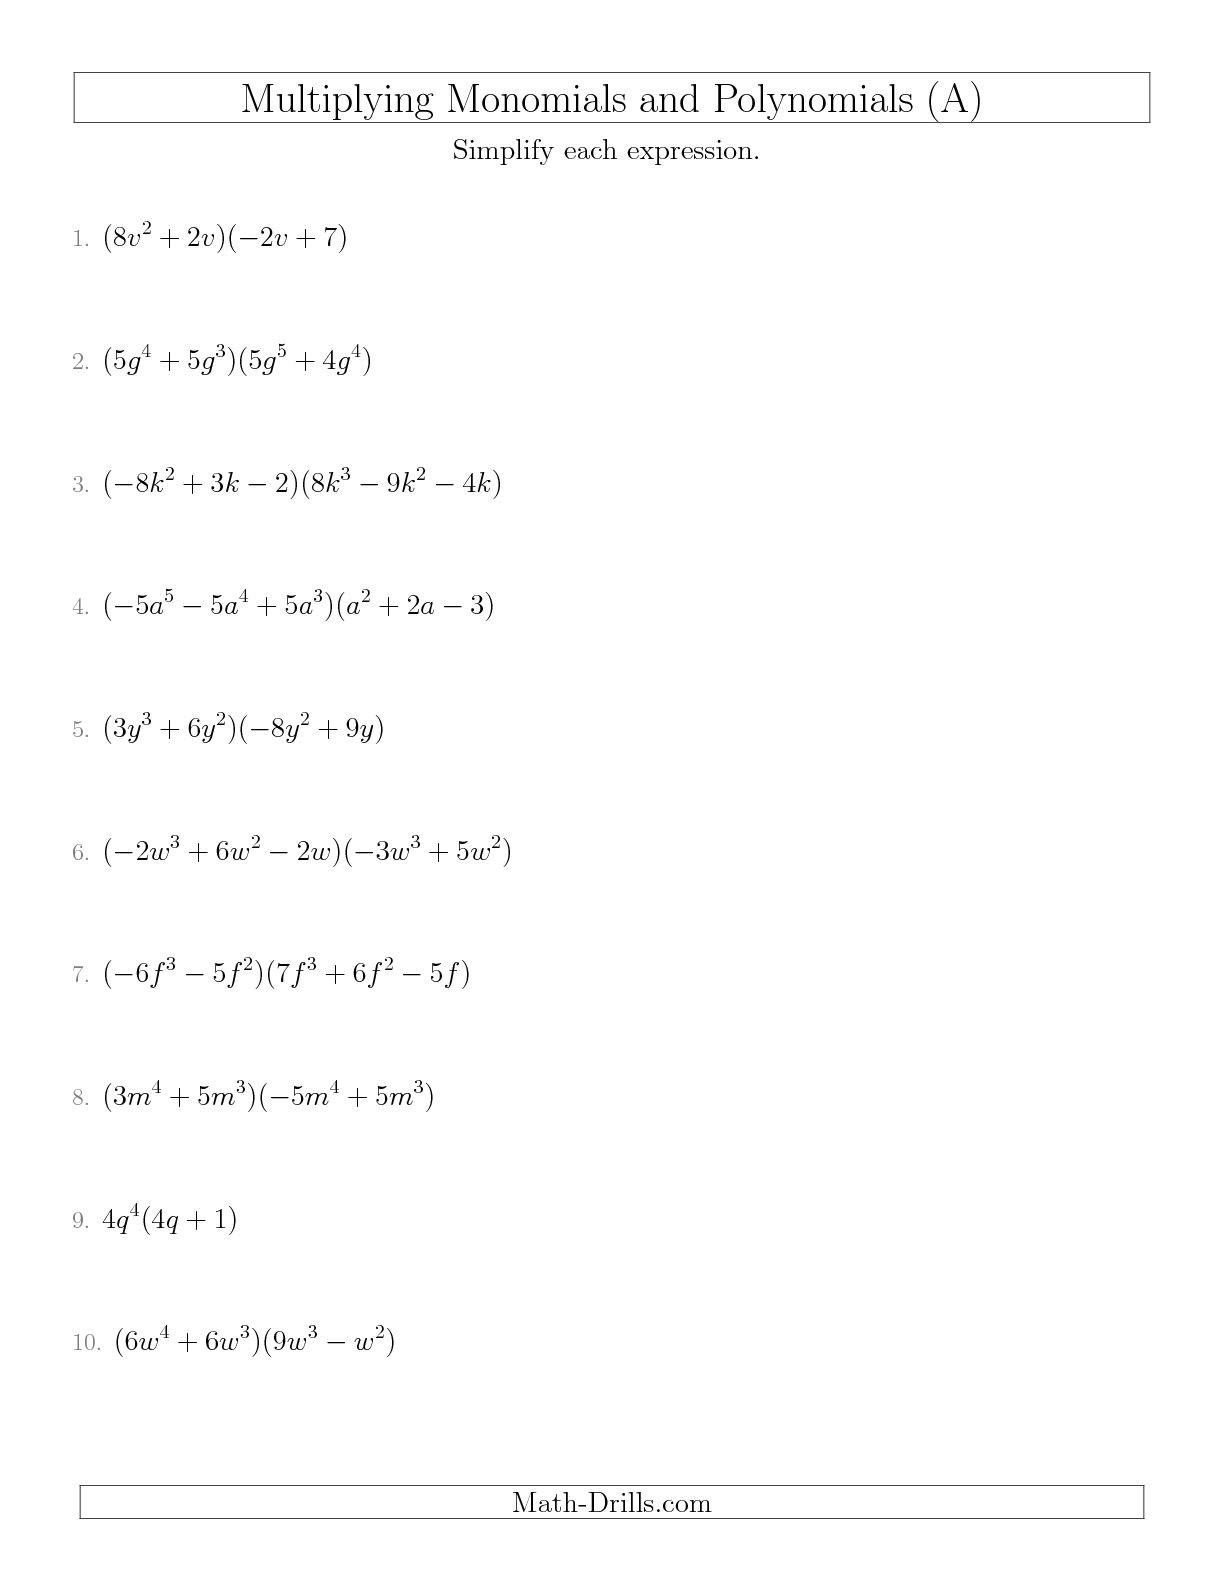 Dividing Polynomials Worksheet Answers Dividing Polynomials by Monomials Worksheet